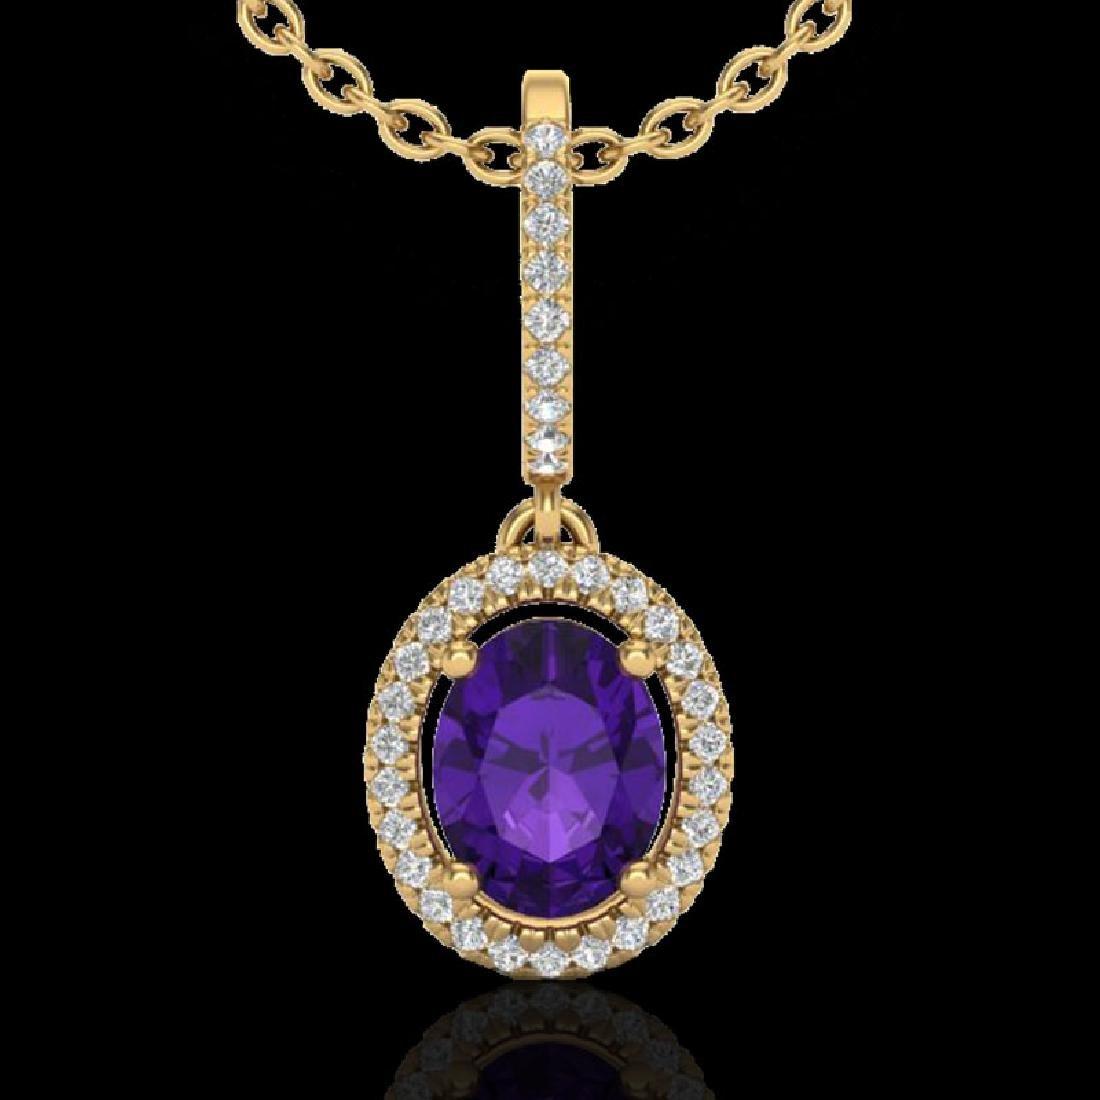 1.75 CTW Amethyst & Micro Pave VS/SI Diamond Necklace